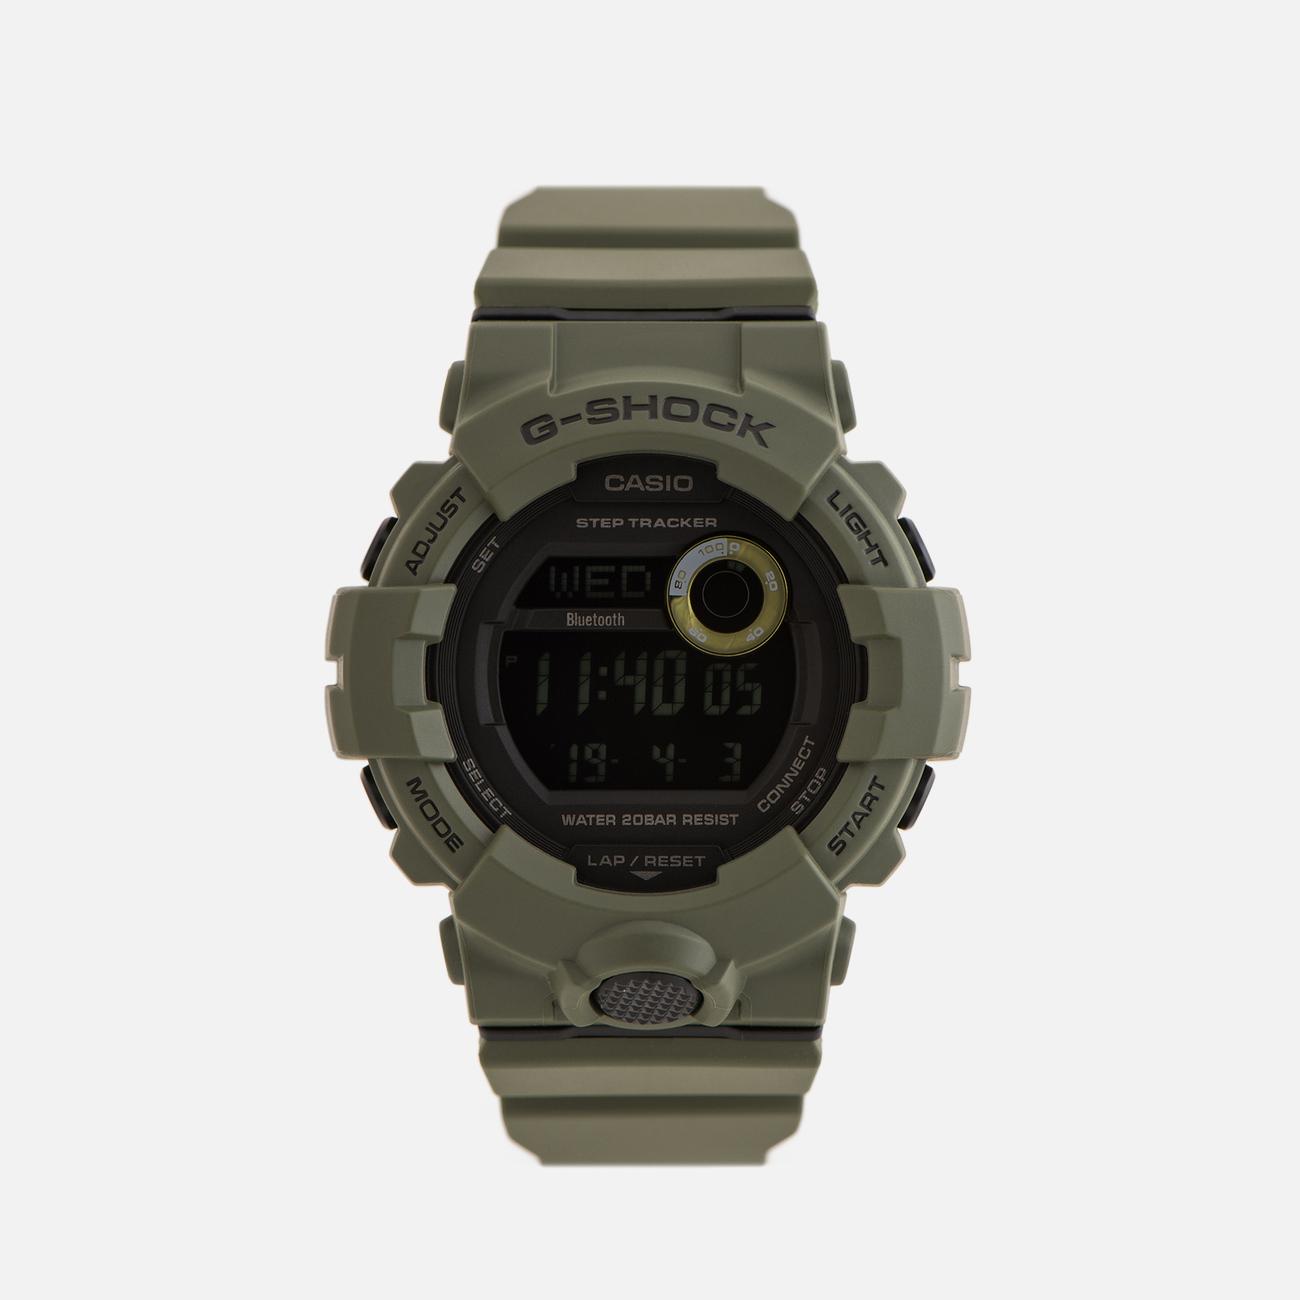 Наручные часы CASIO G-SHOCK GBD-800UC-3ER G-SQUAD Utility Color Green